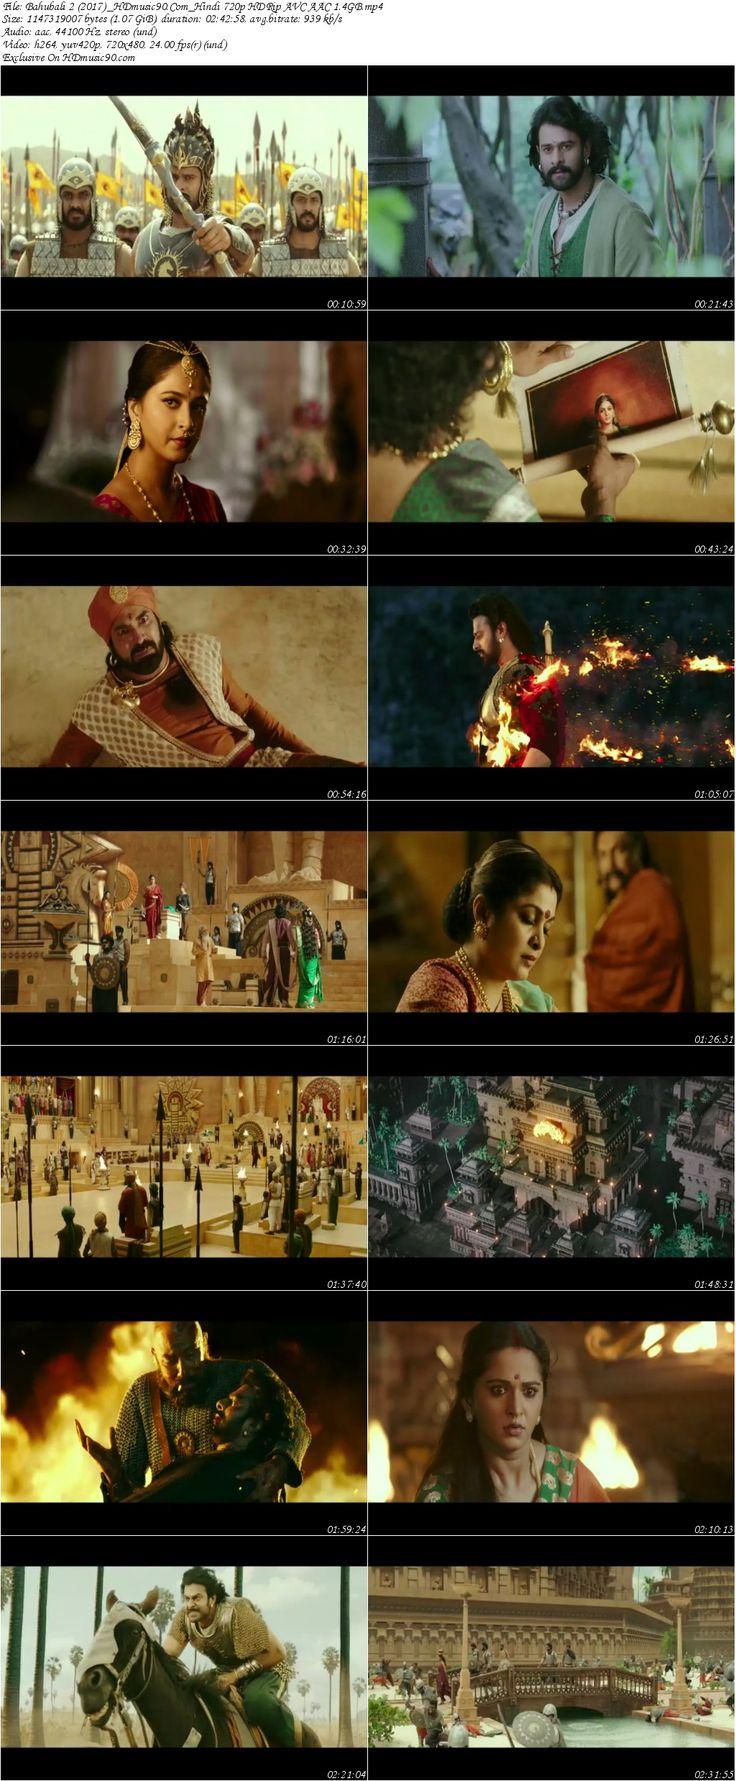 Bahubali 2 Full Movie Download HD Free Download | BDmusic365.com